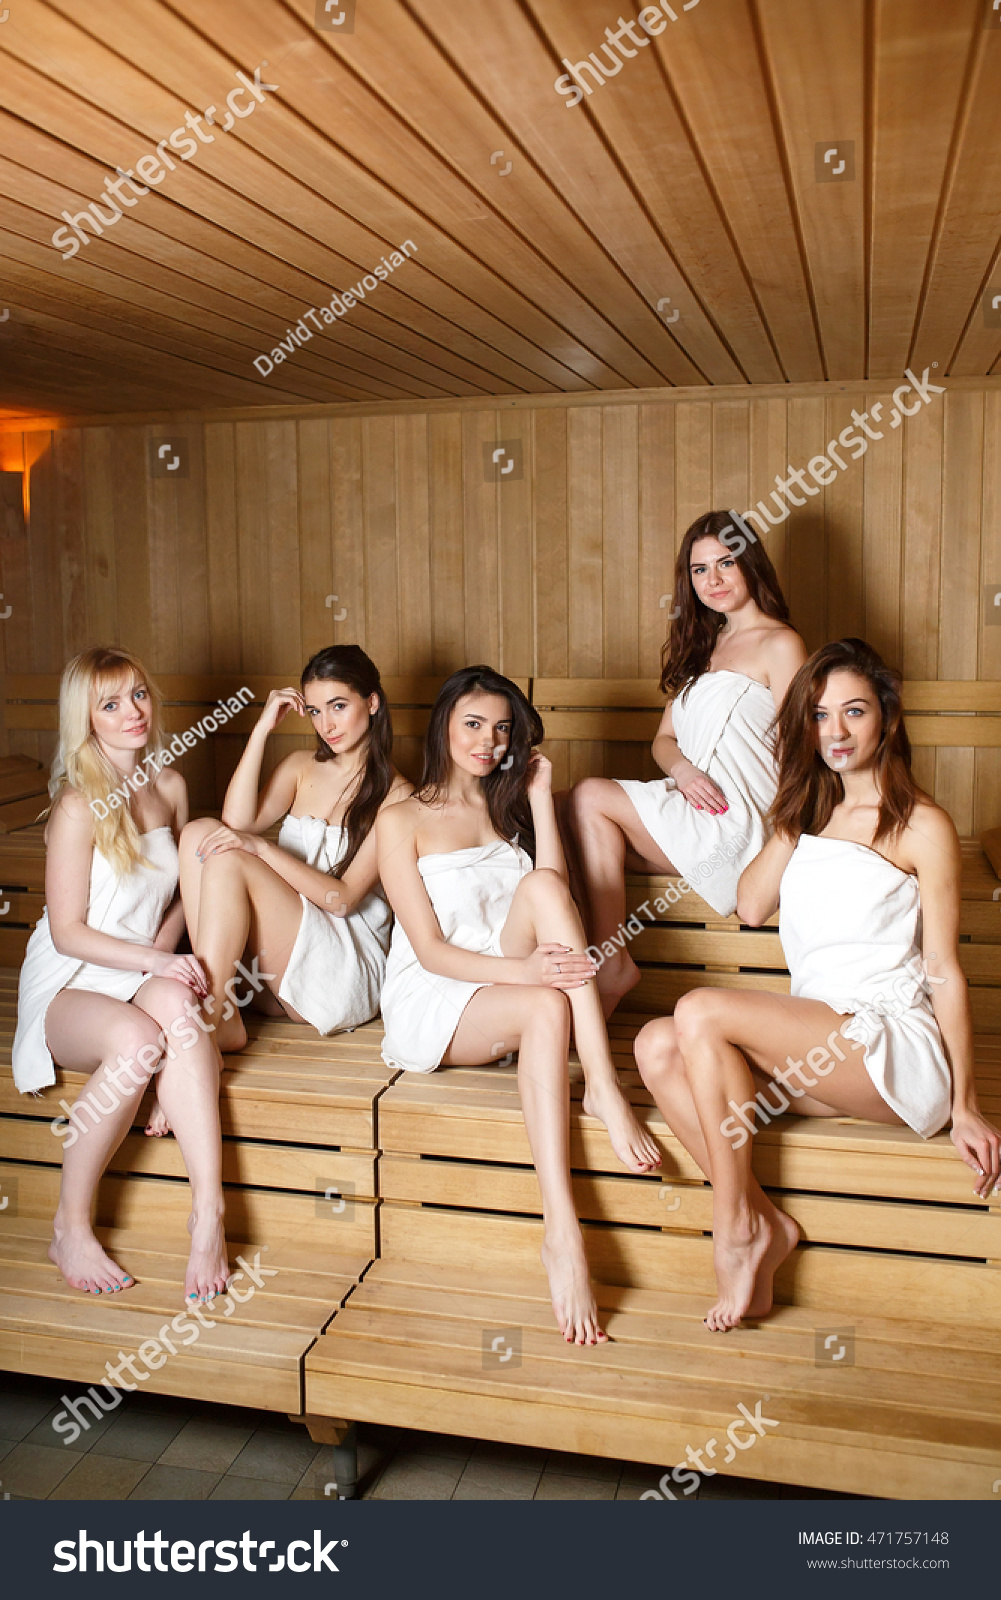 stock-photo-girls-relaxing-in-the-sauna-